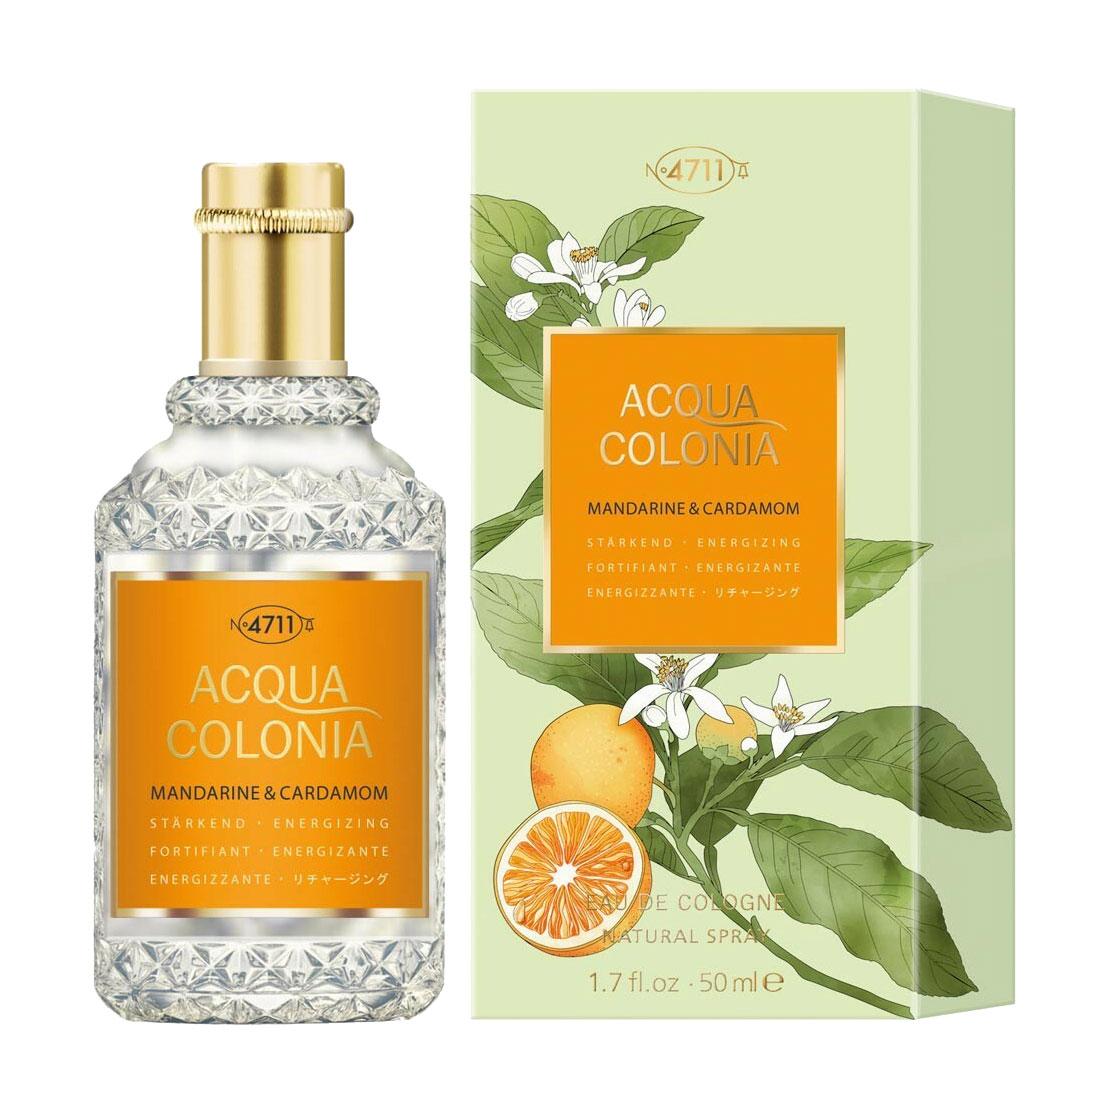 Maurer & Wirtz 4711 Acqua Colonia Mandarine & Cardamom Одеколон унісекс, 50 мл